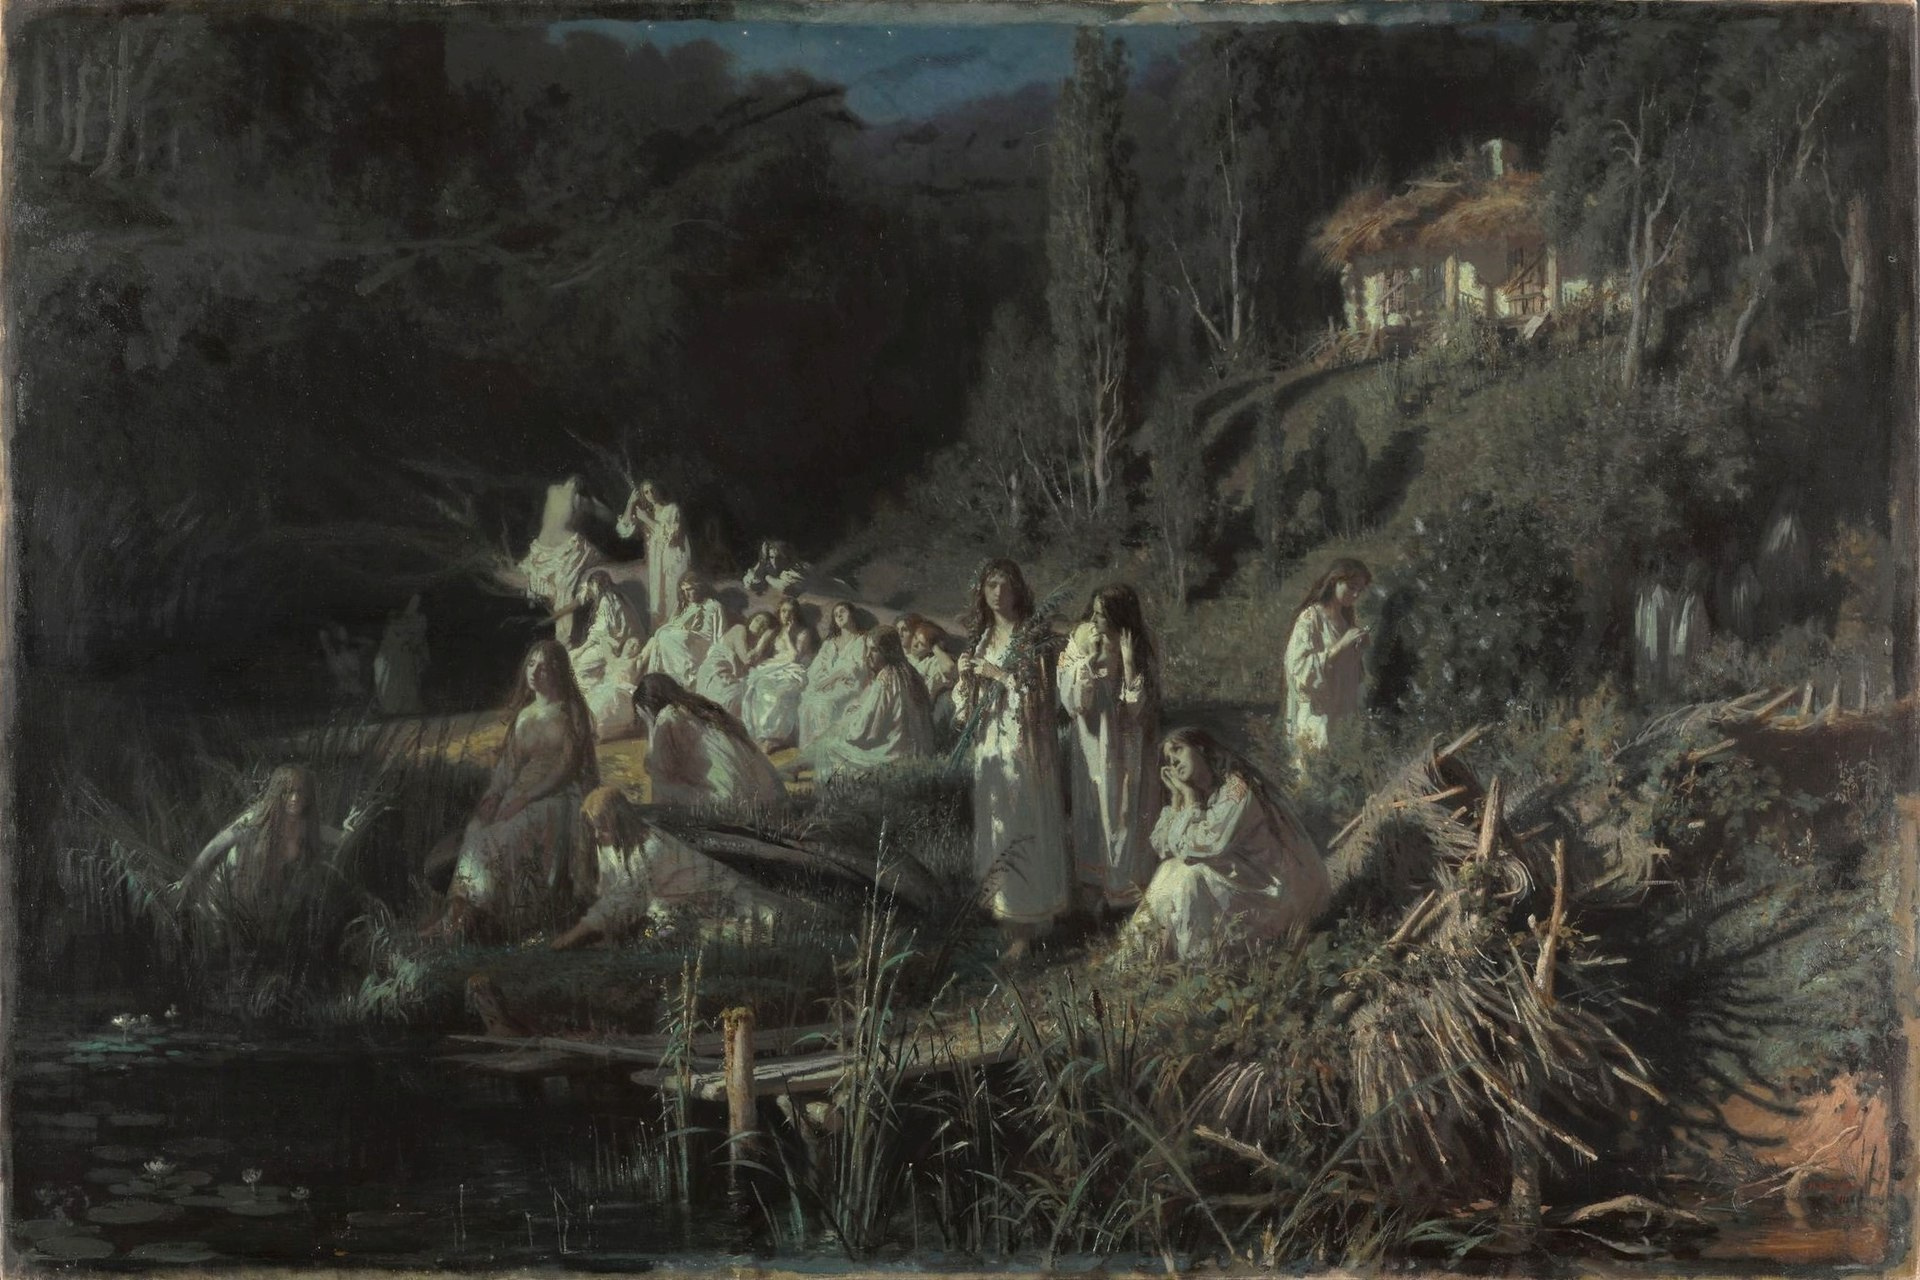 Описание картины Ивана Крамского «Русалки»